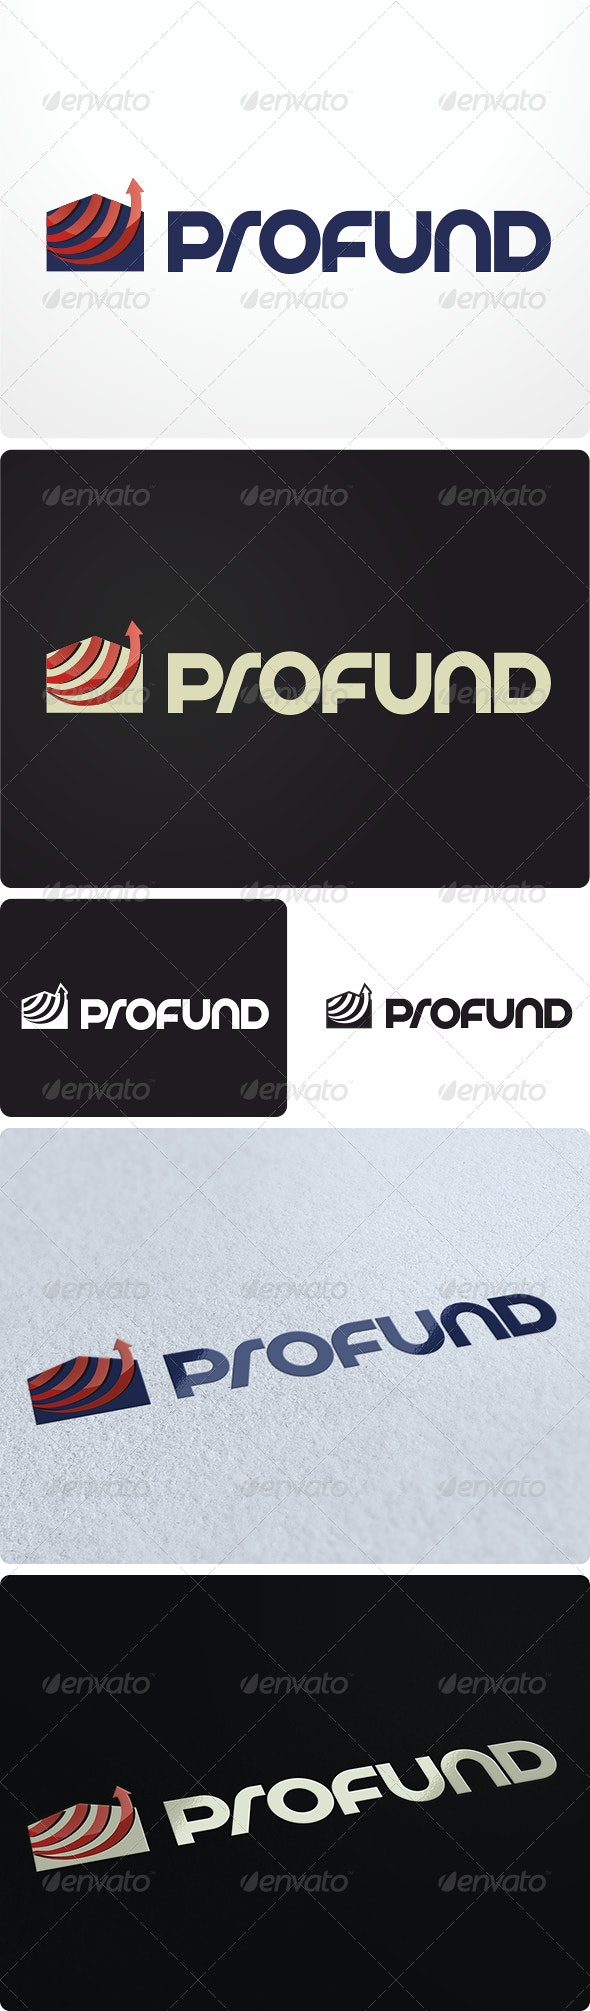 ProFund Logo Design - Buildings Logo Templates